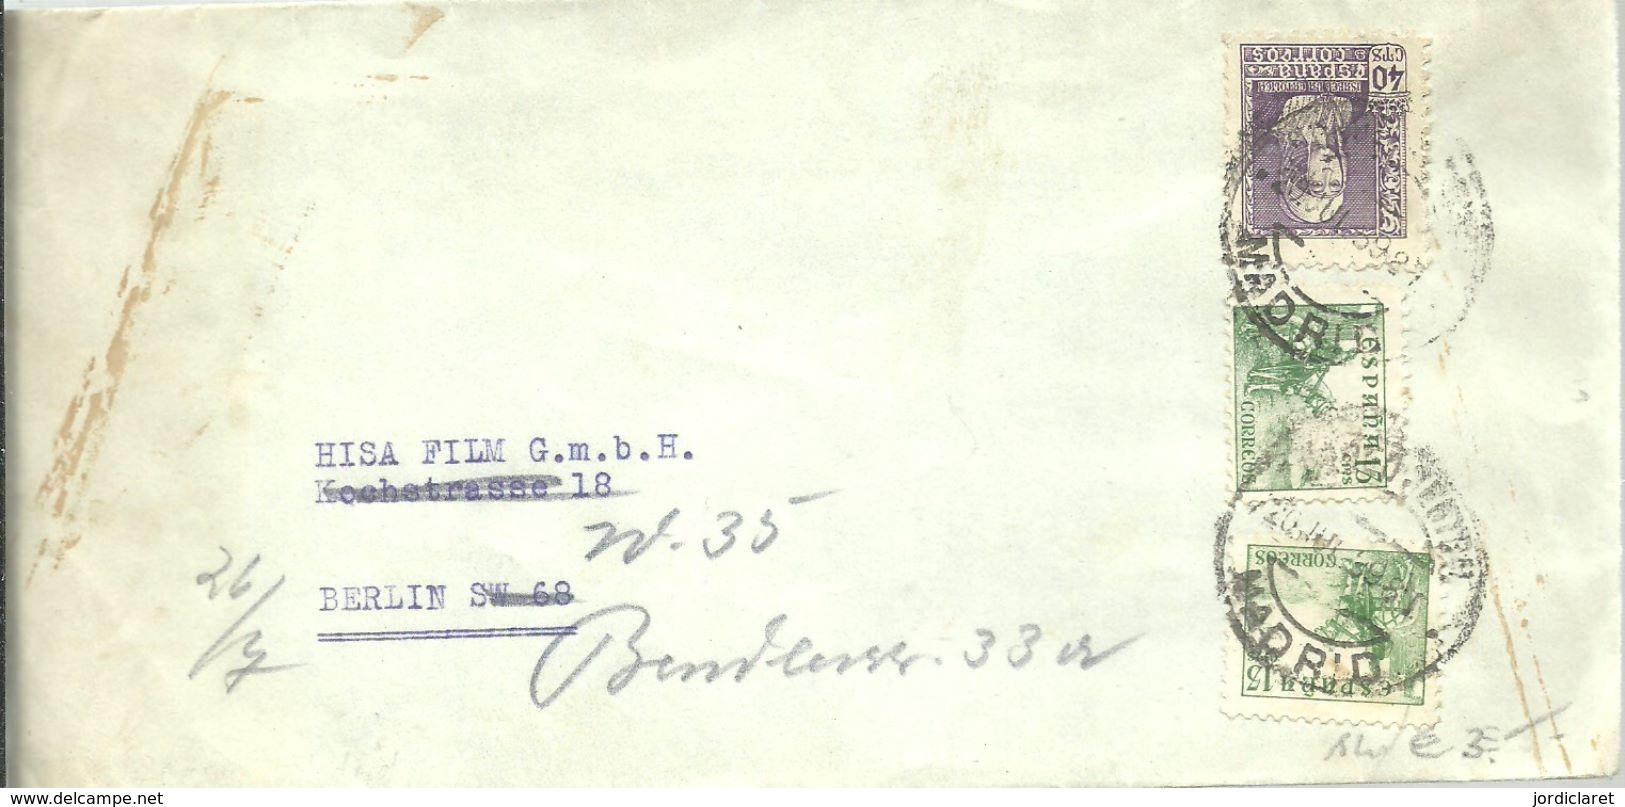 CARTA 1939  CENSURA MILITAR - Marcas De Censura Nacional